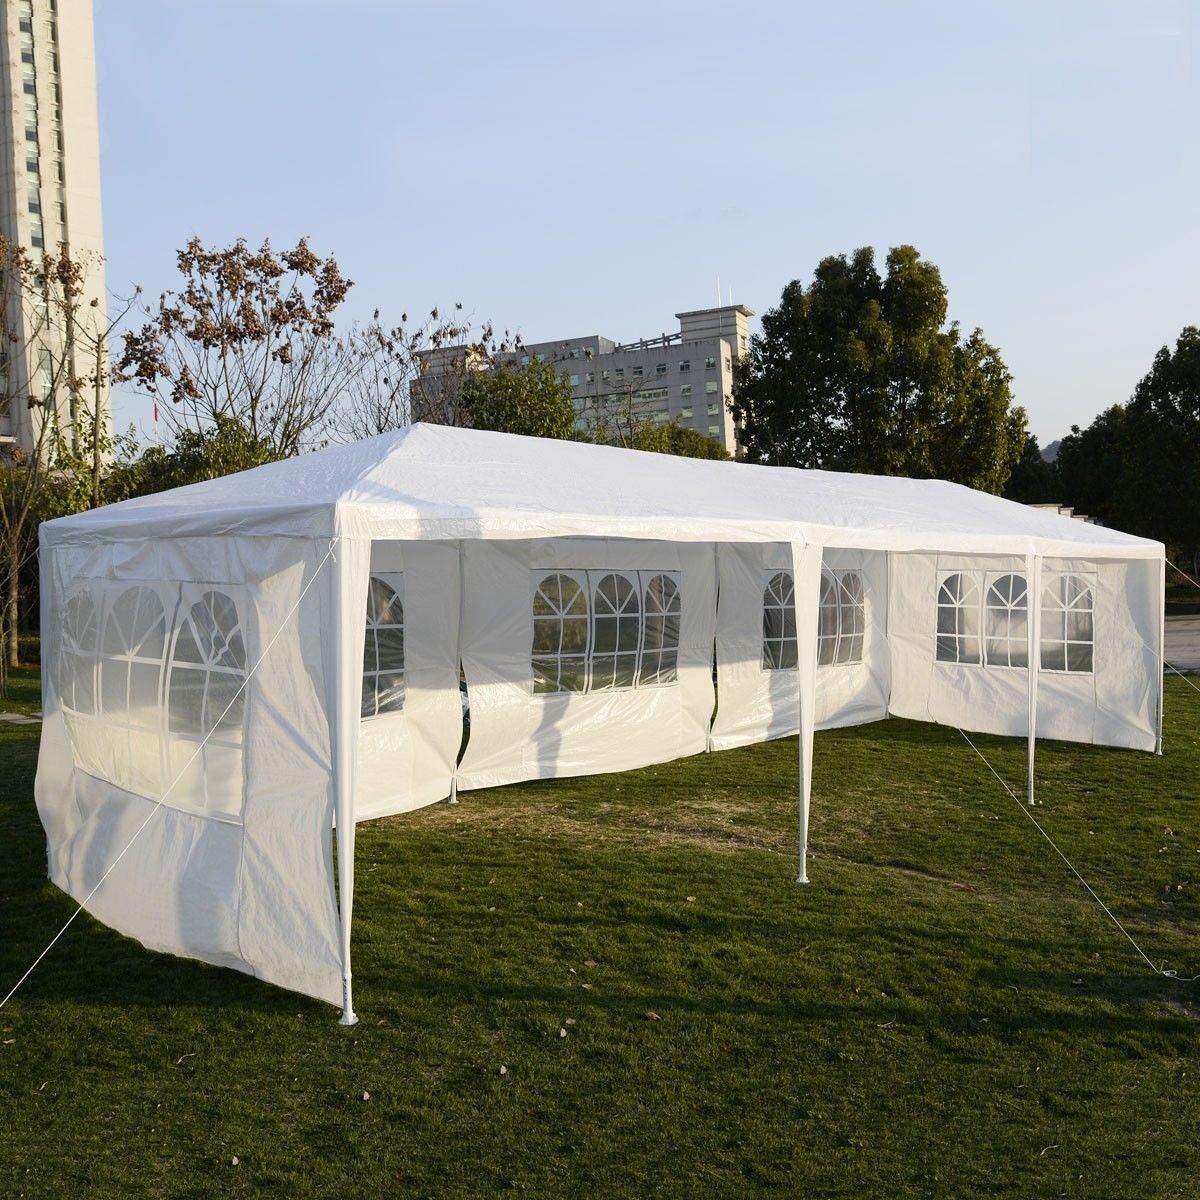 10 X 30 Heavy Duty Outdoor Canopy Event Tent Wedding Party Gazebo Patio Pavilion 141[並行輸入]   B01DIG0HIW